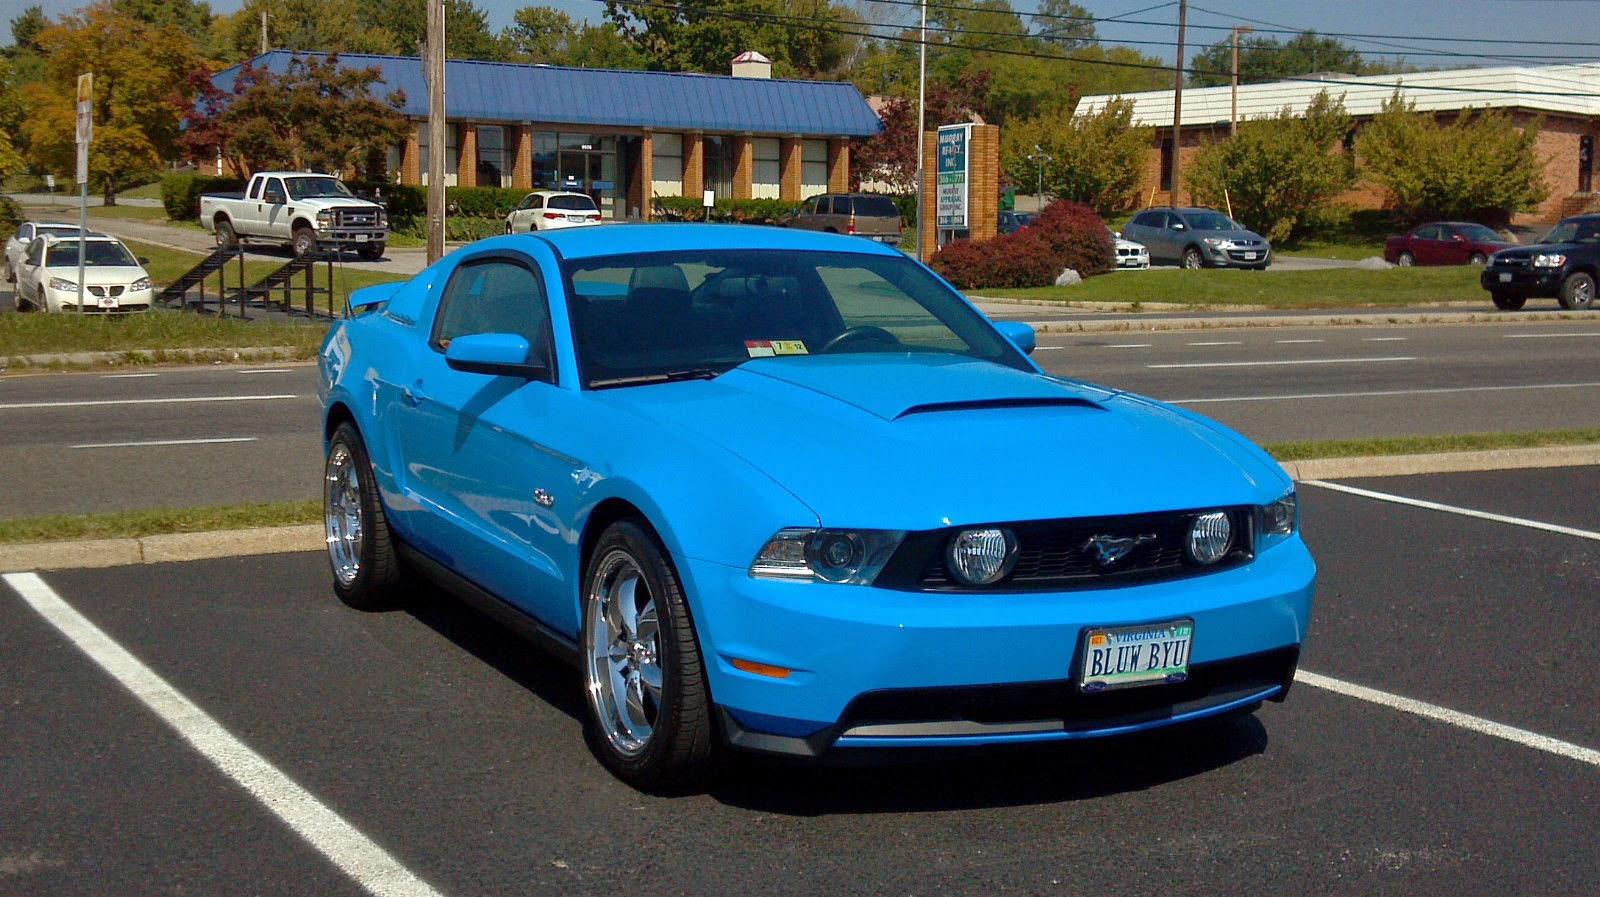 Mustang Roush For Sale >> 2011 Grabber Blue Ford Mustang GT/5.0 ~ For Sale American ...